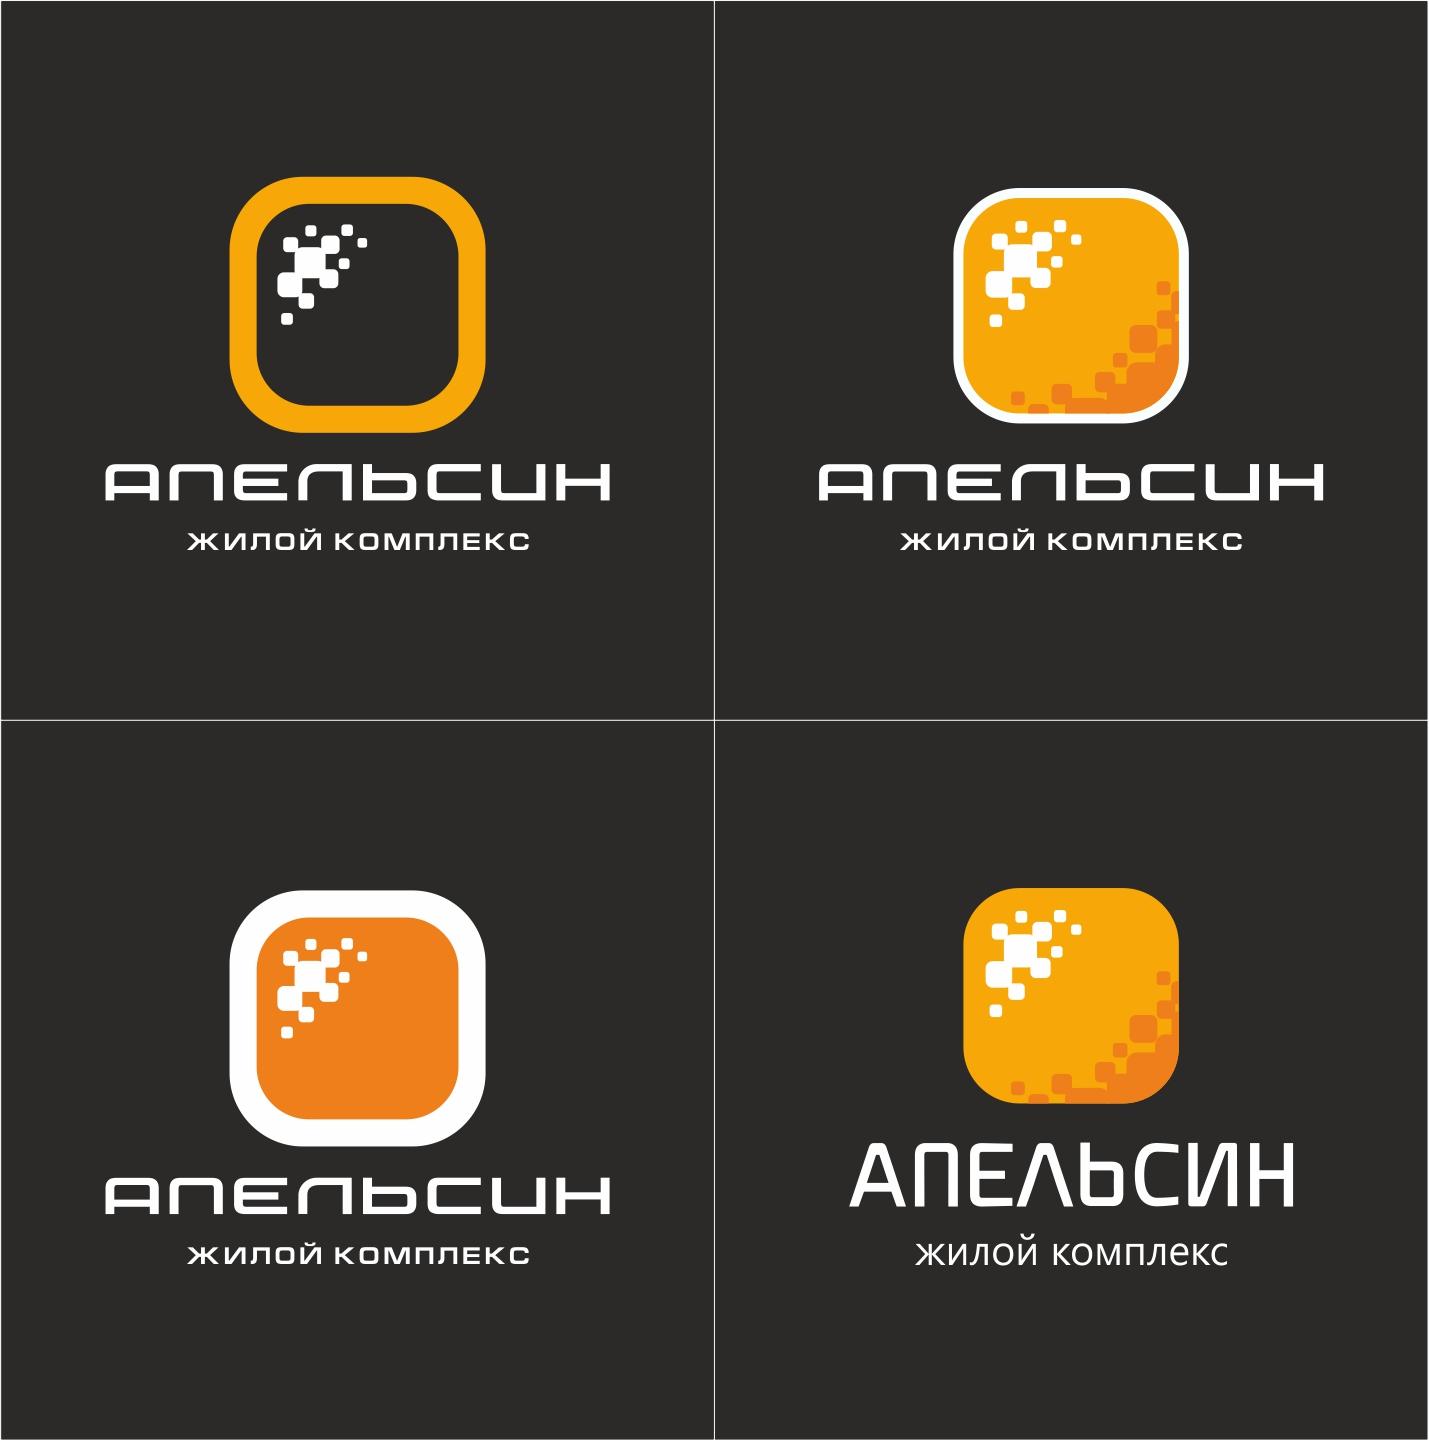 Логотип и фирменный стиль фото f_6265a719b3067098.jpg